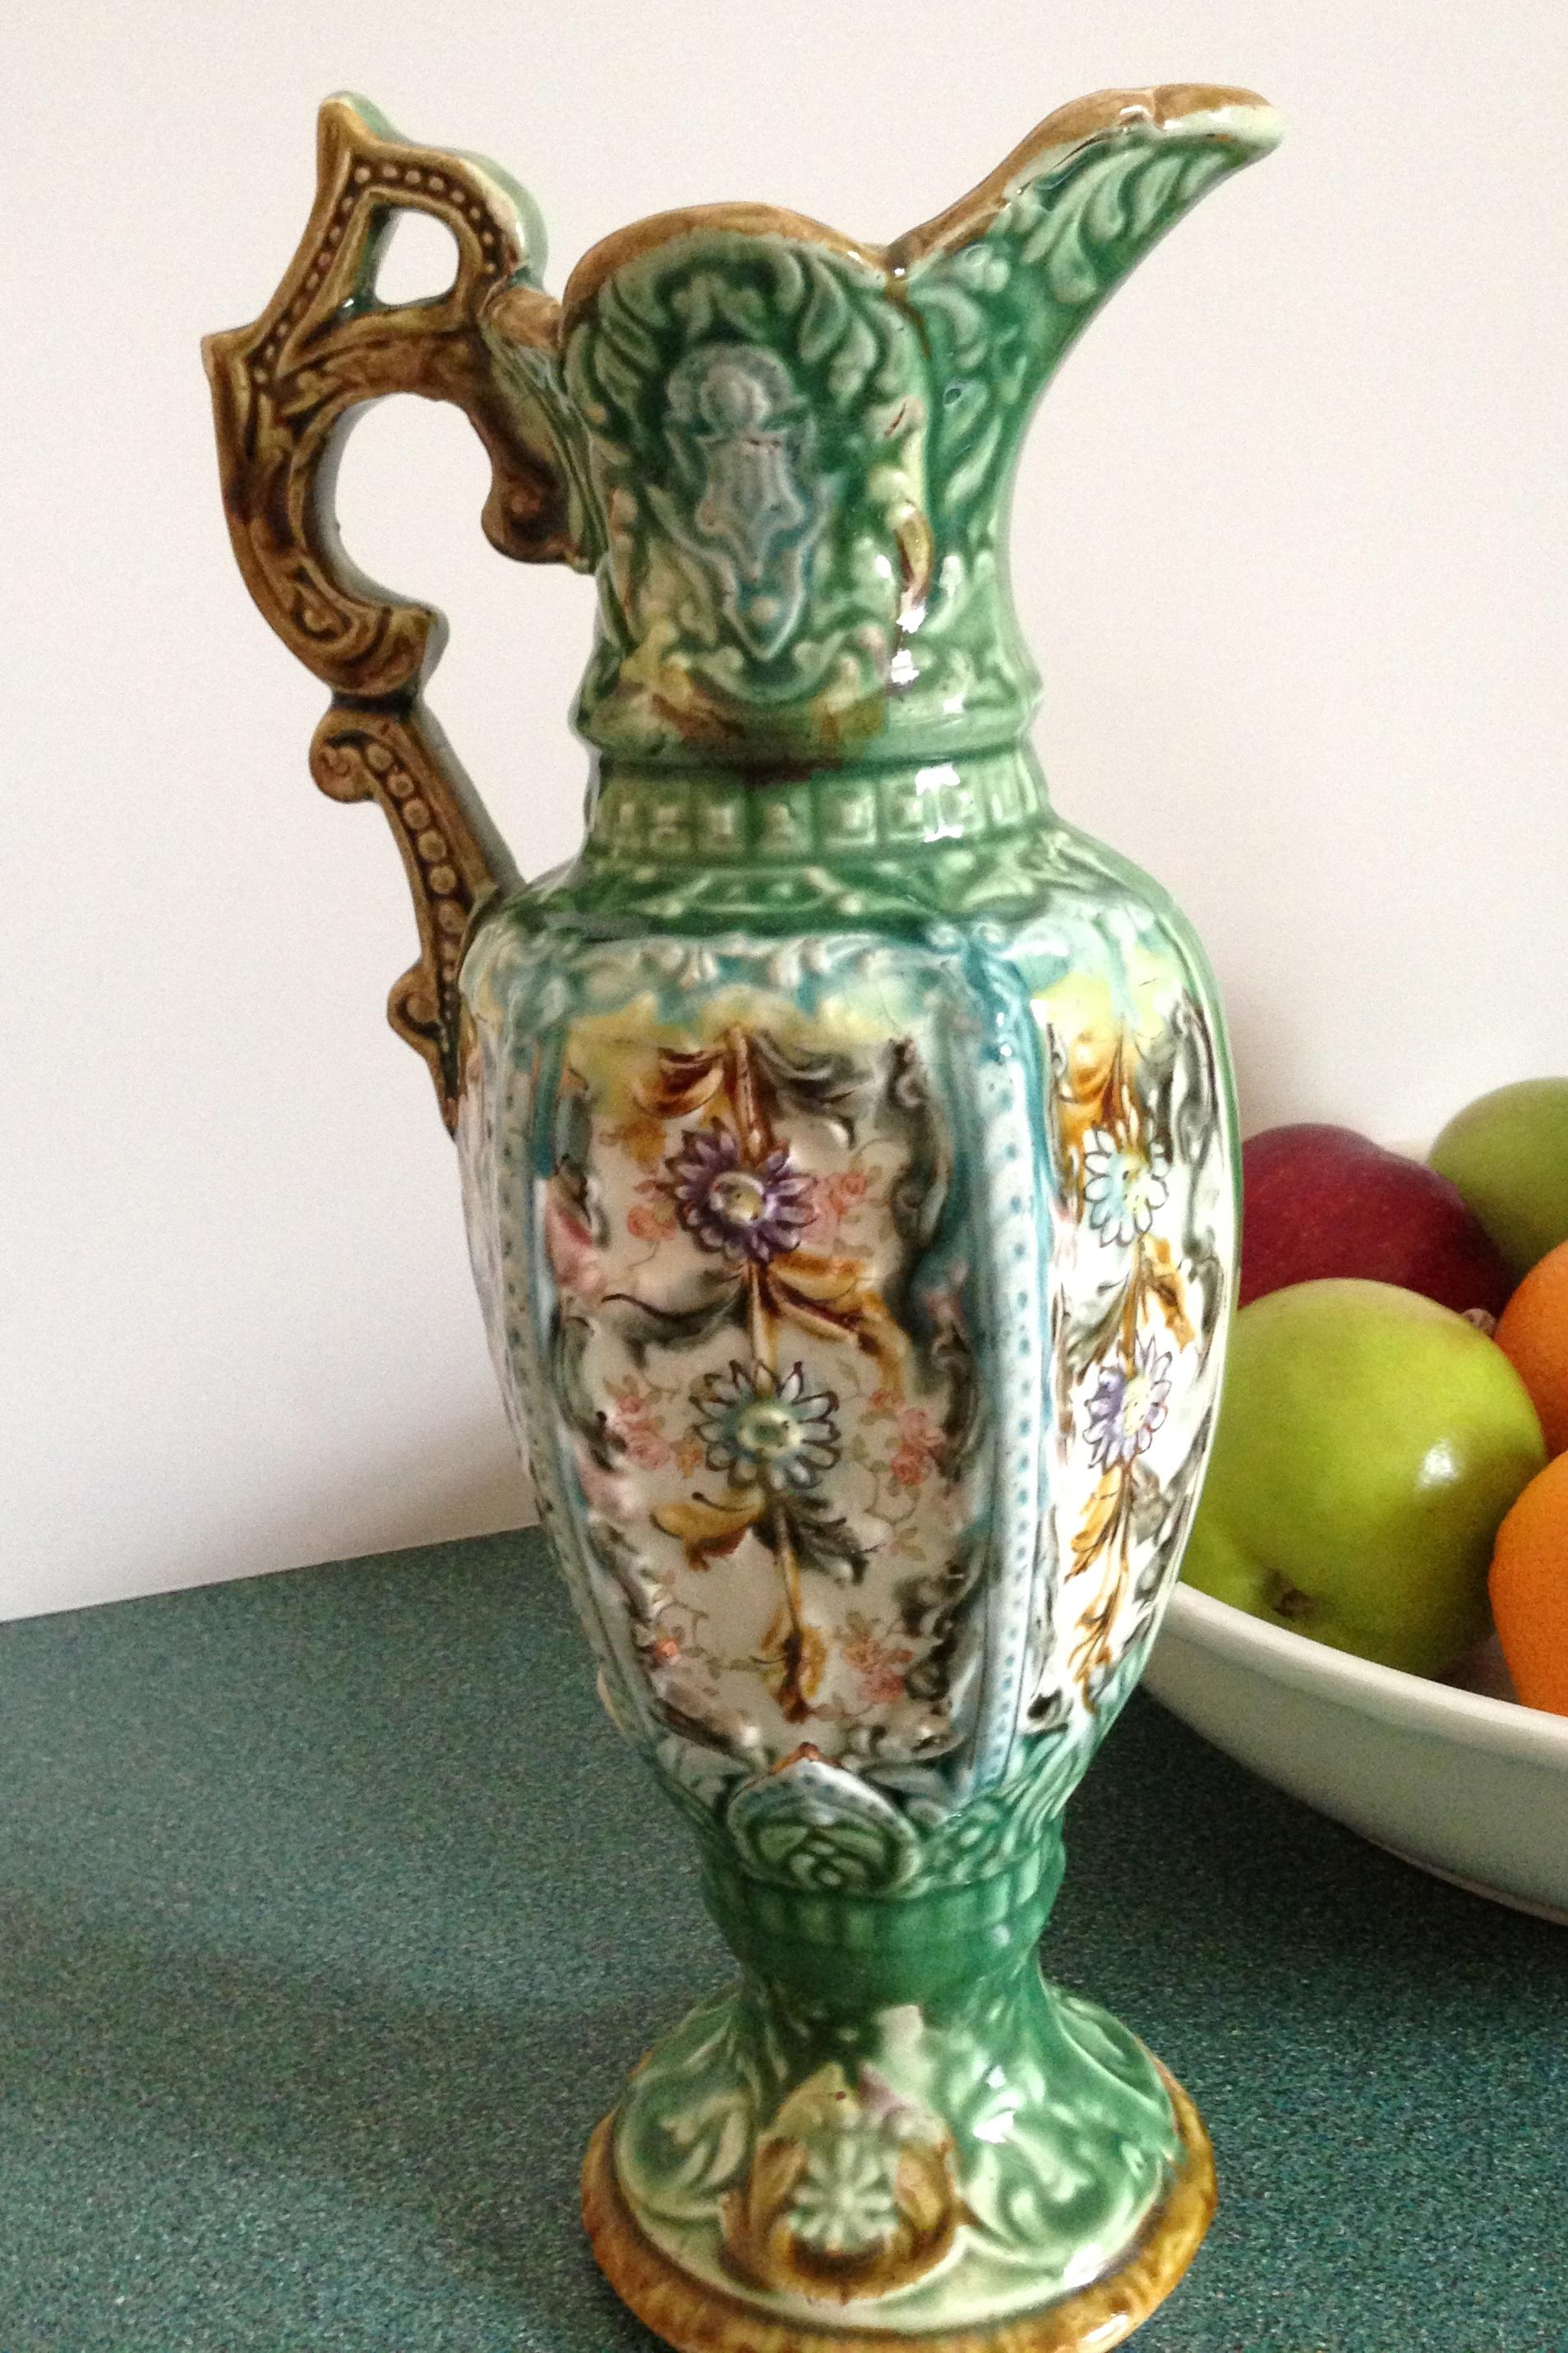 Grannys majolica is it worth 20000 or 20 janvier road majolica vase circa 1900s reviewsmspy